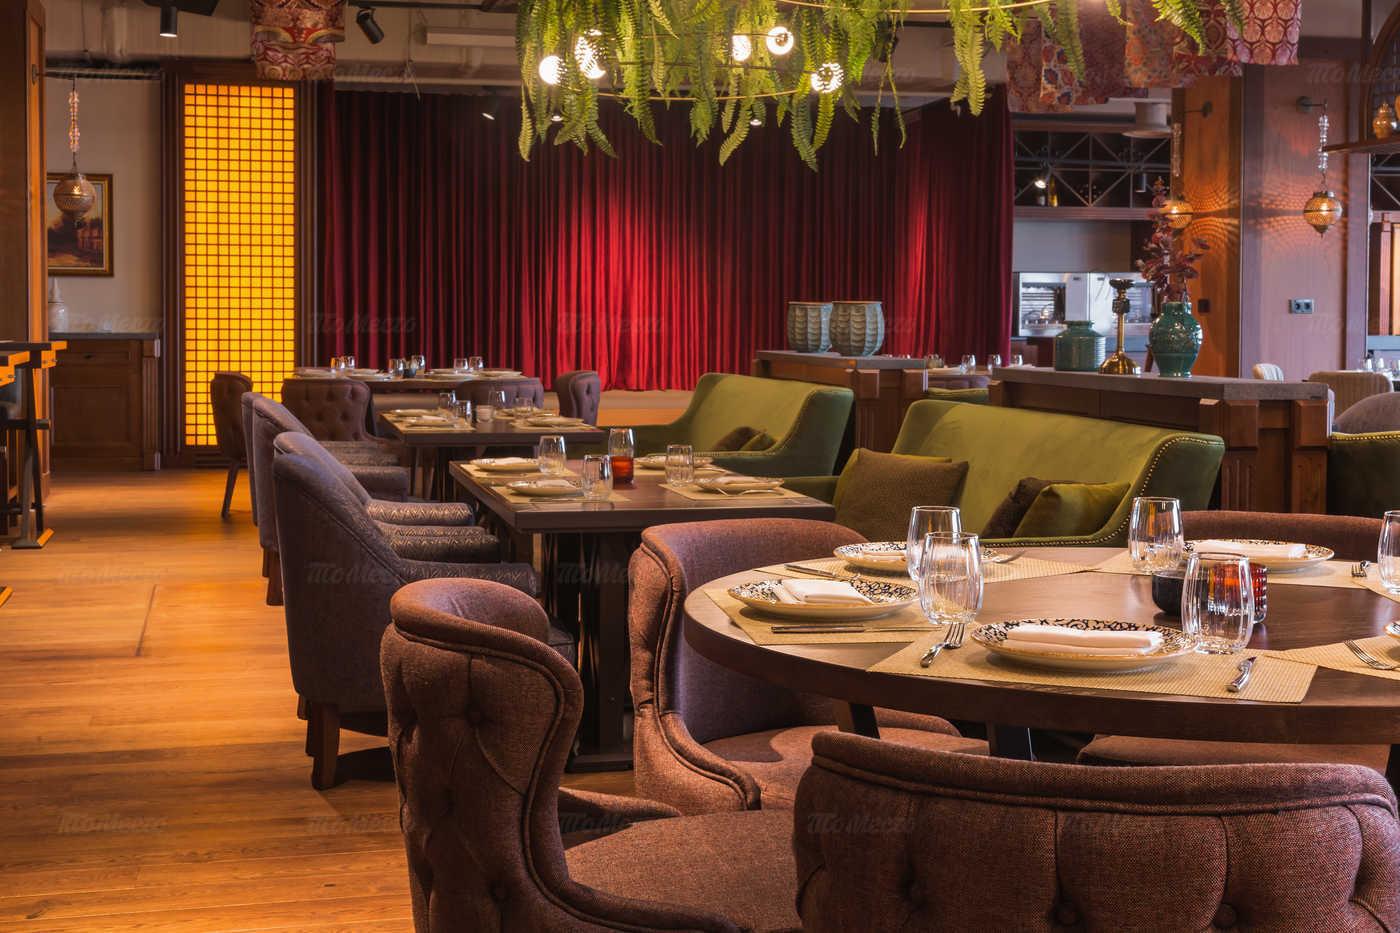 Ресторан Левантин (Levantine) на Новинском бульваре фото 13